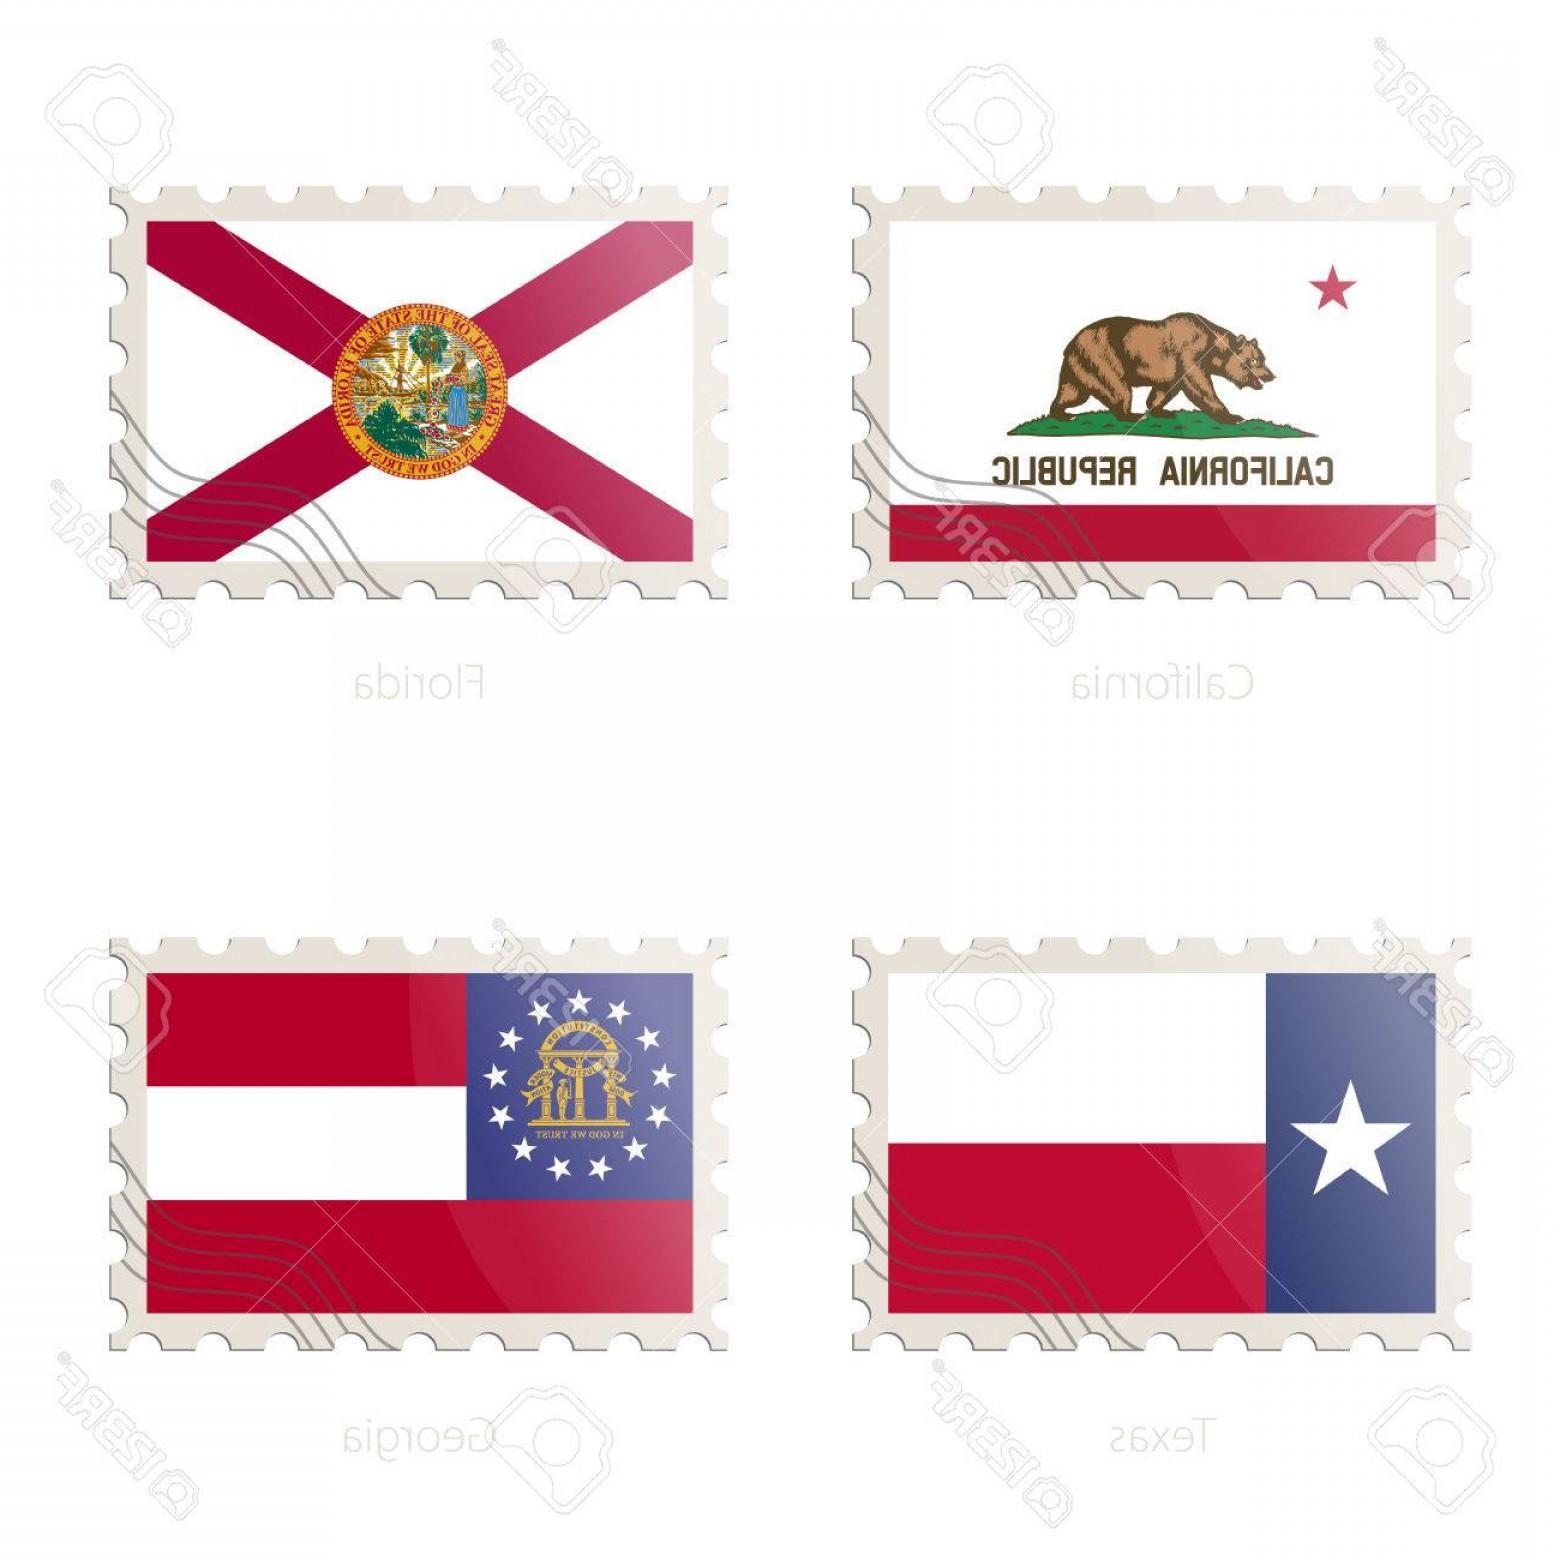 1560x1560 Plain Black And White Vector Texas Flag Arenawp